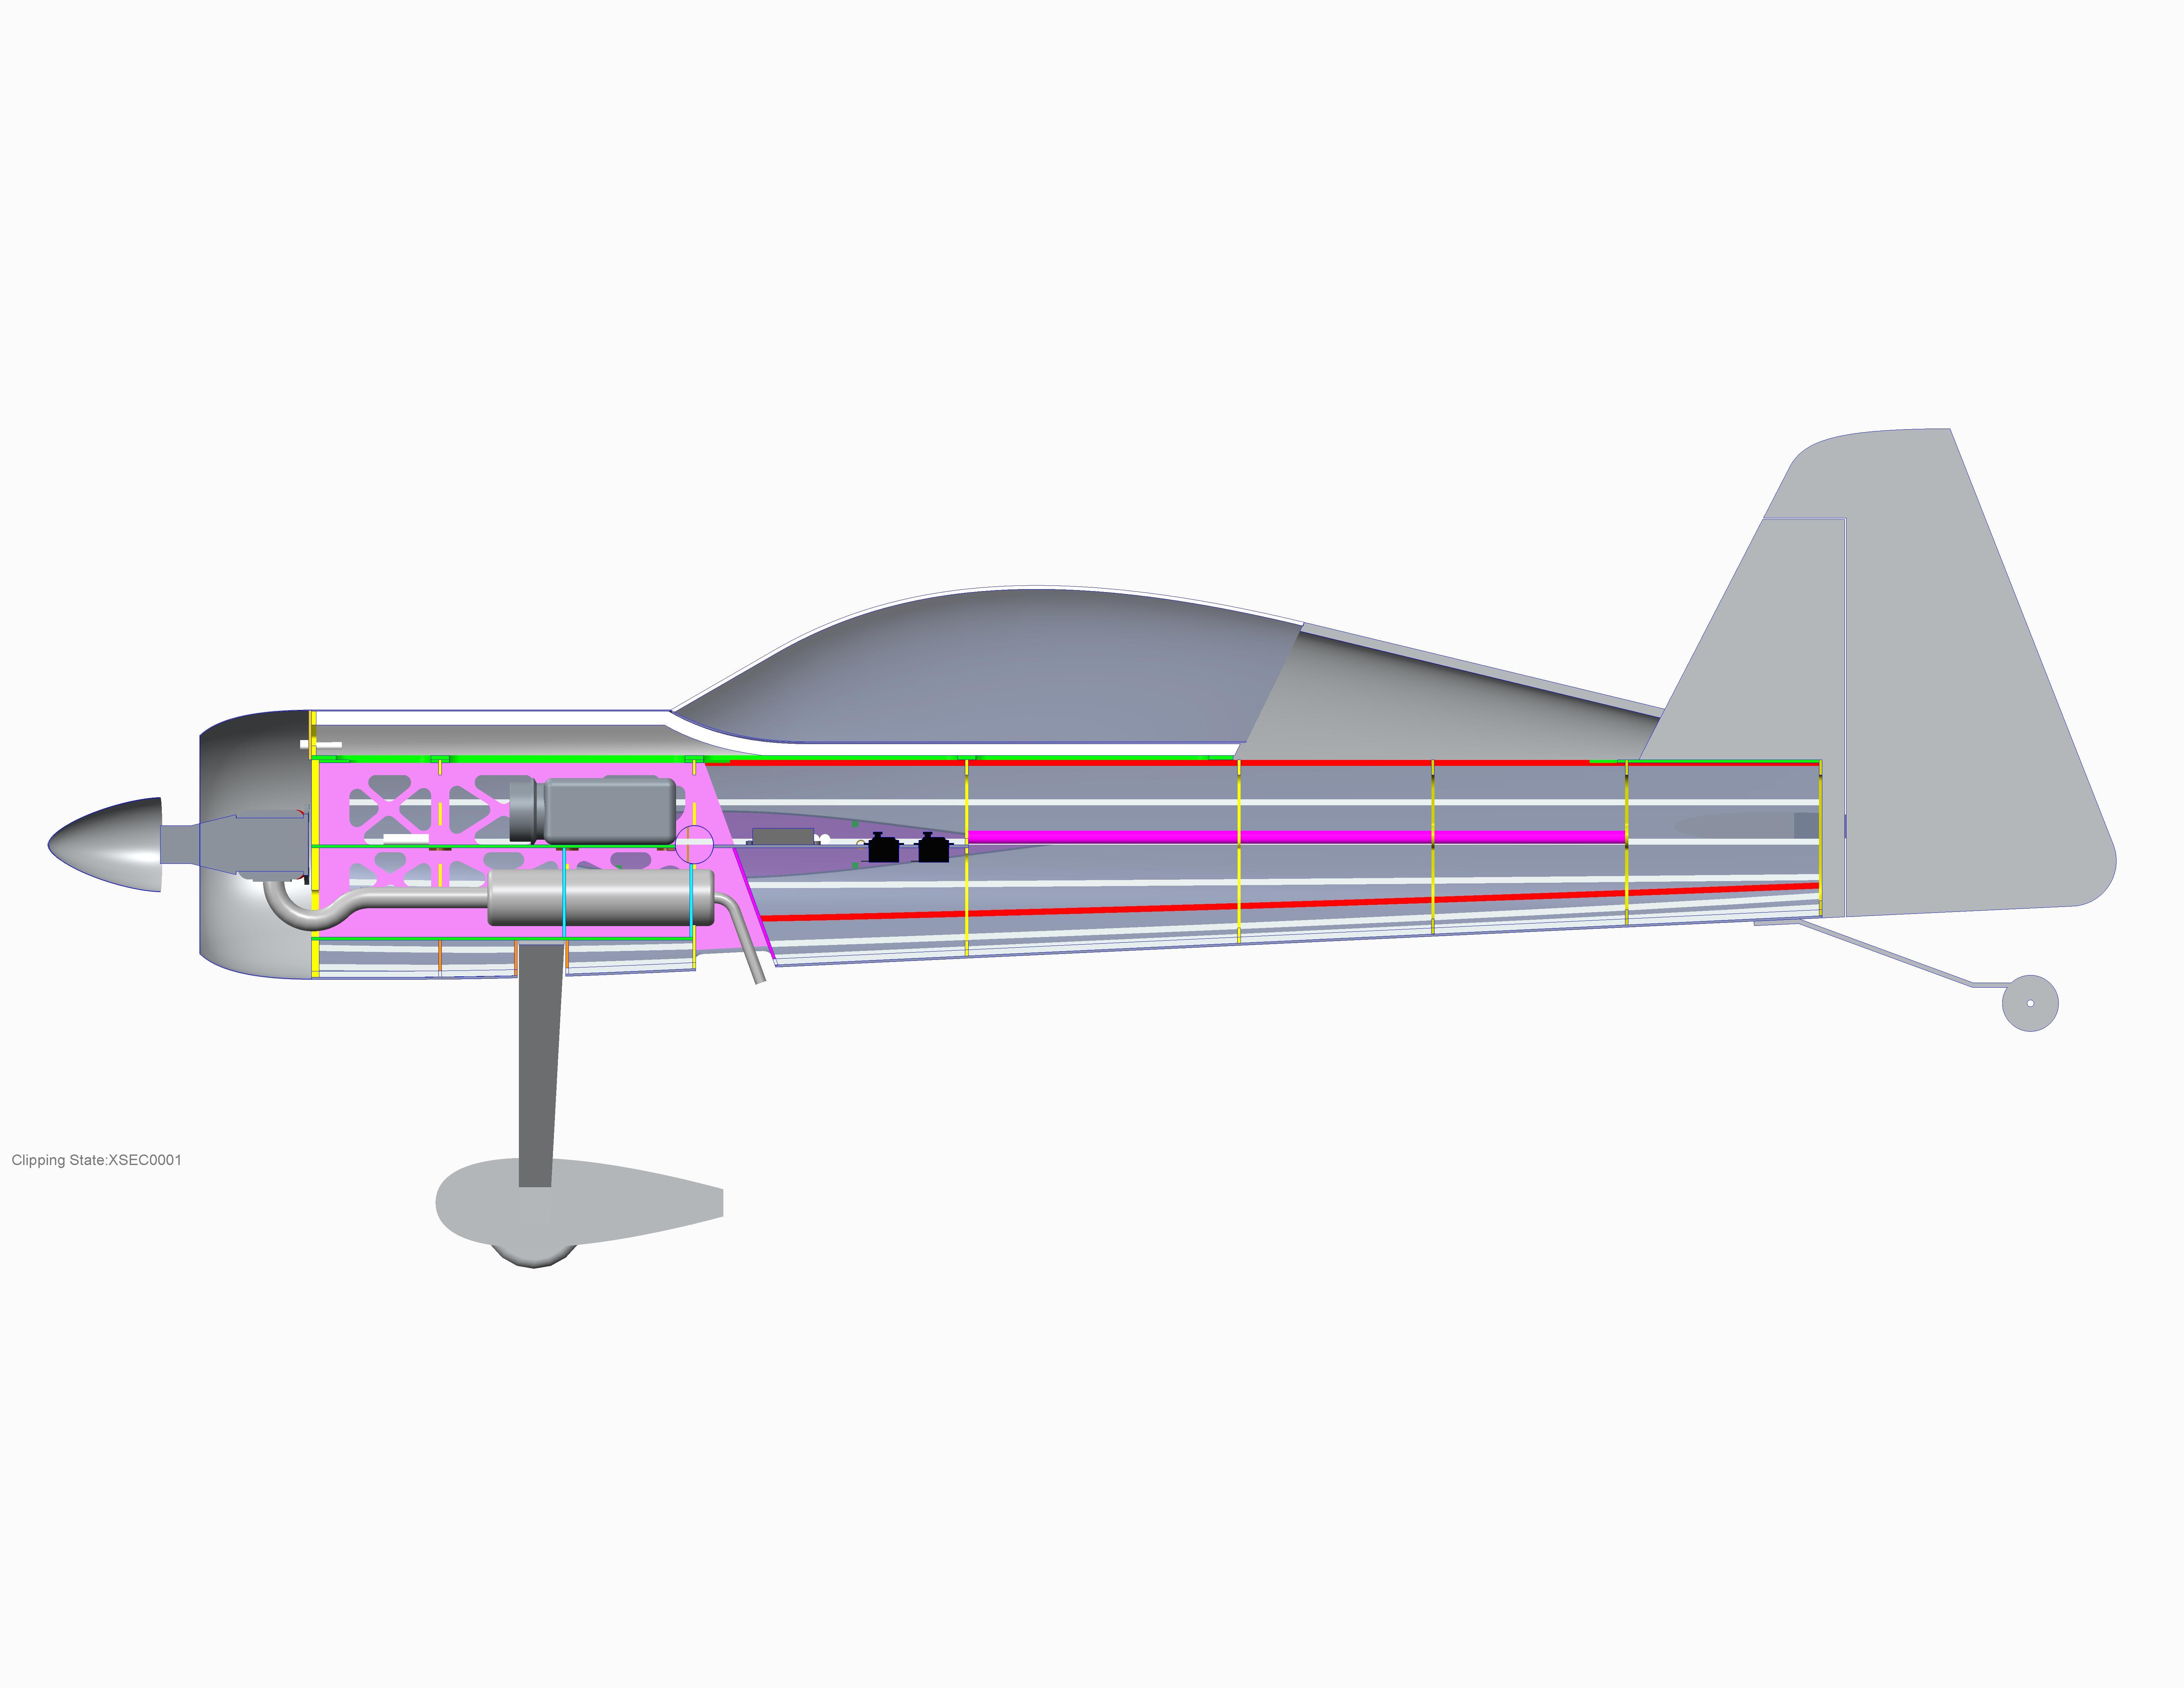 yak-54 3,0m cad-7